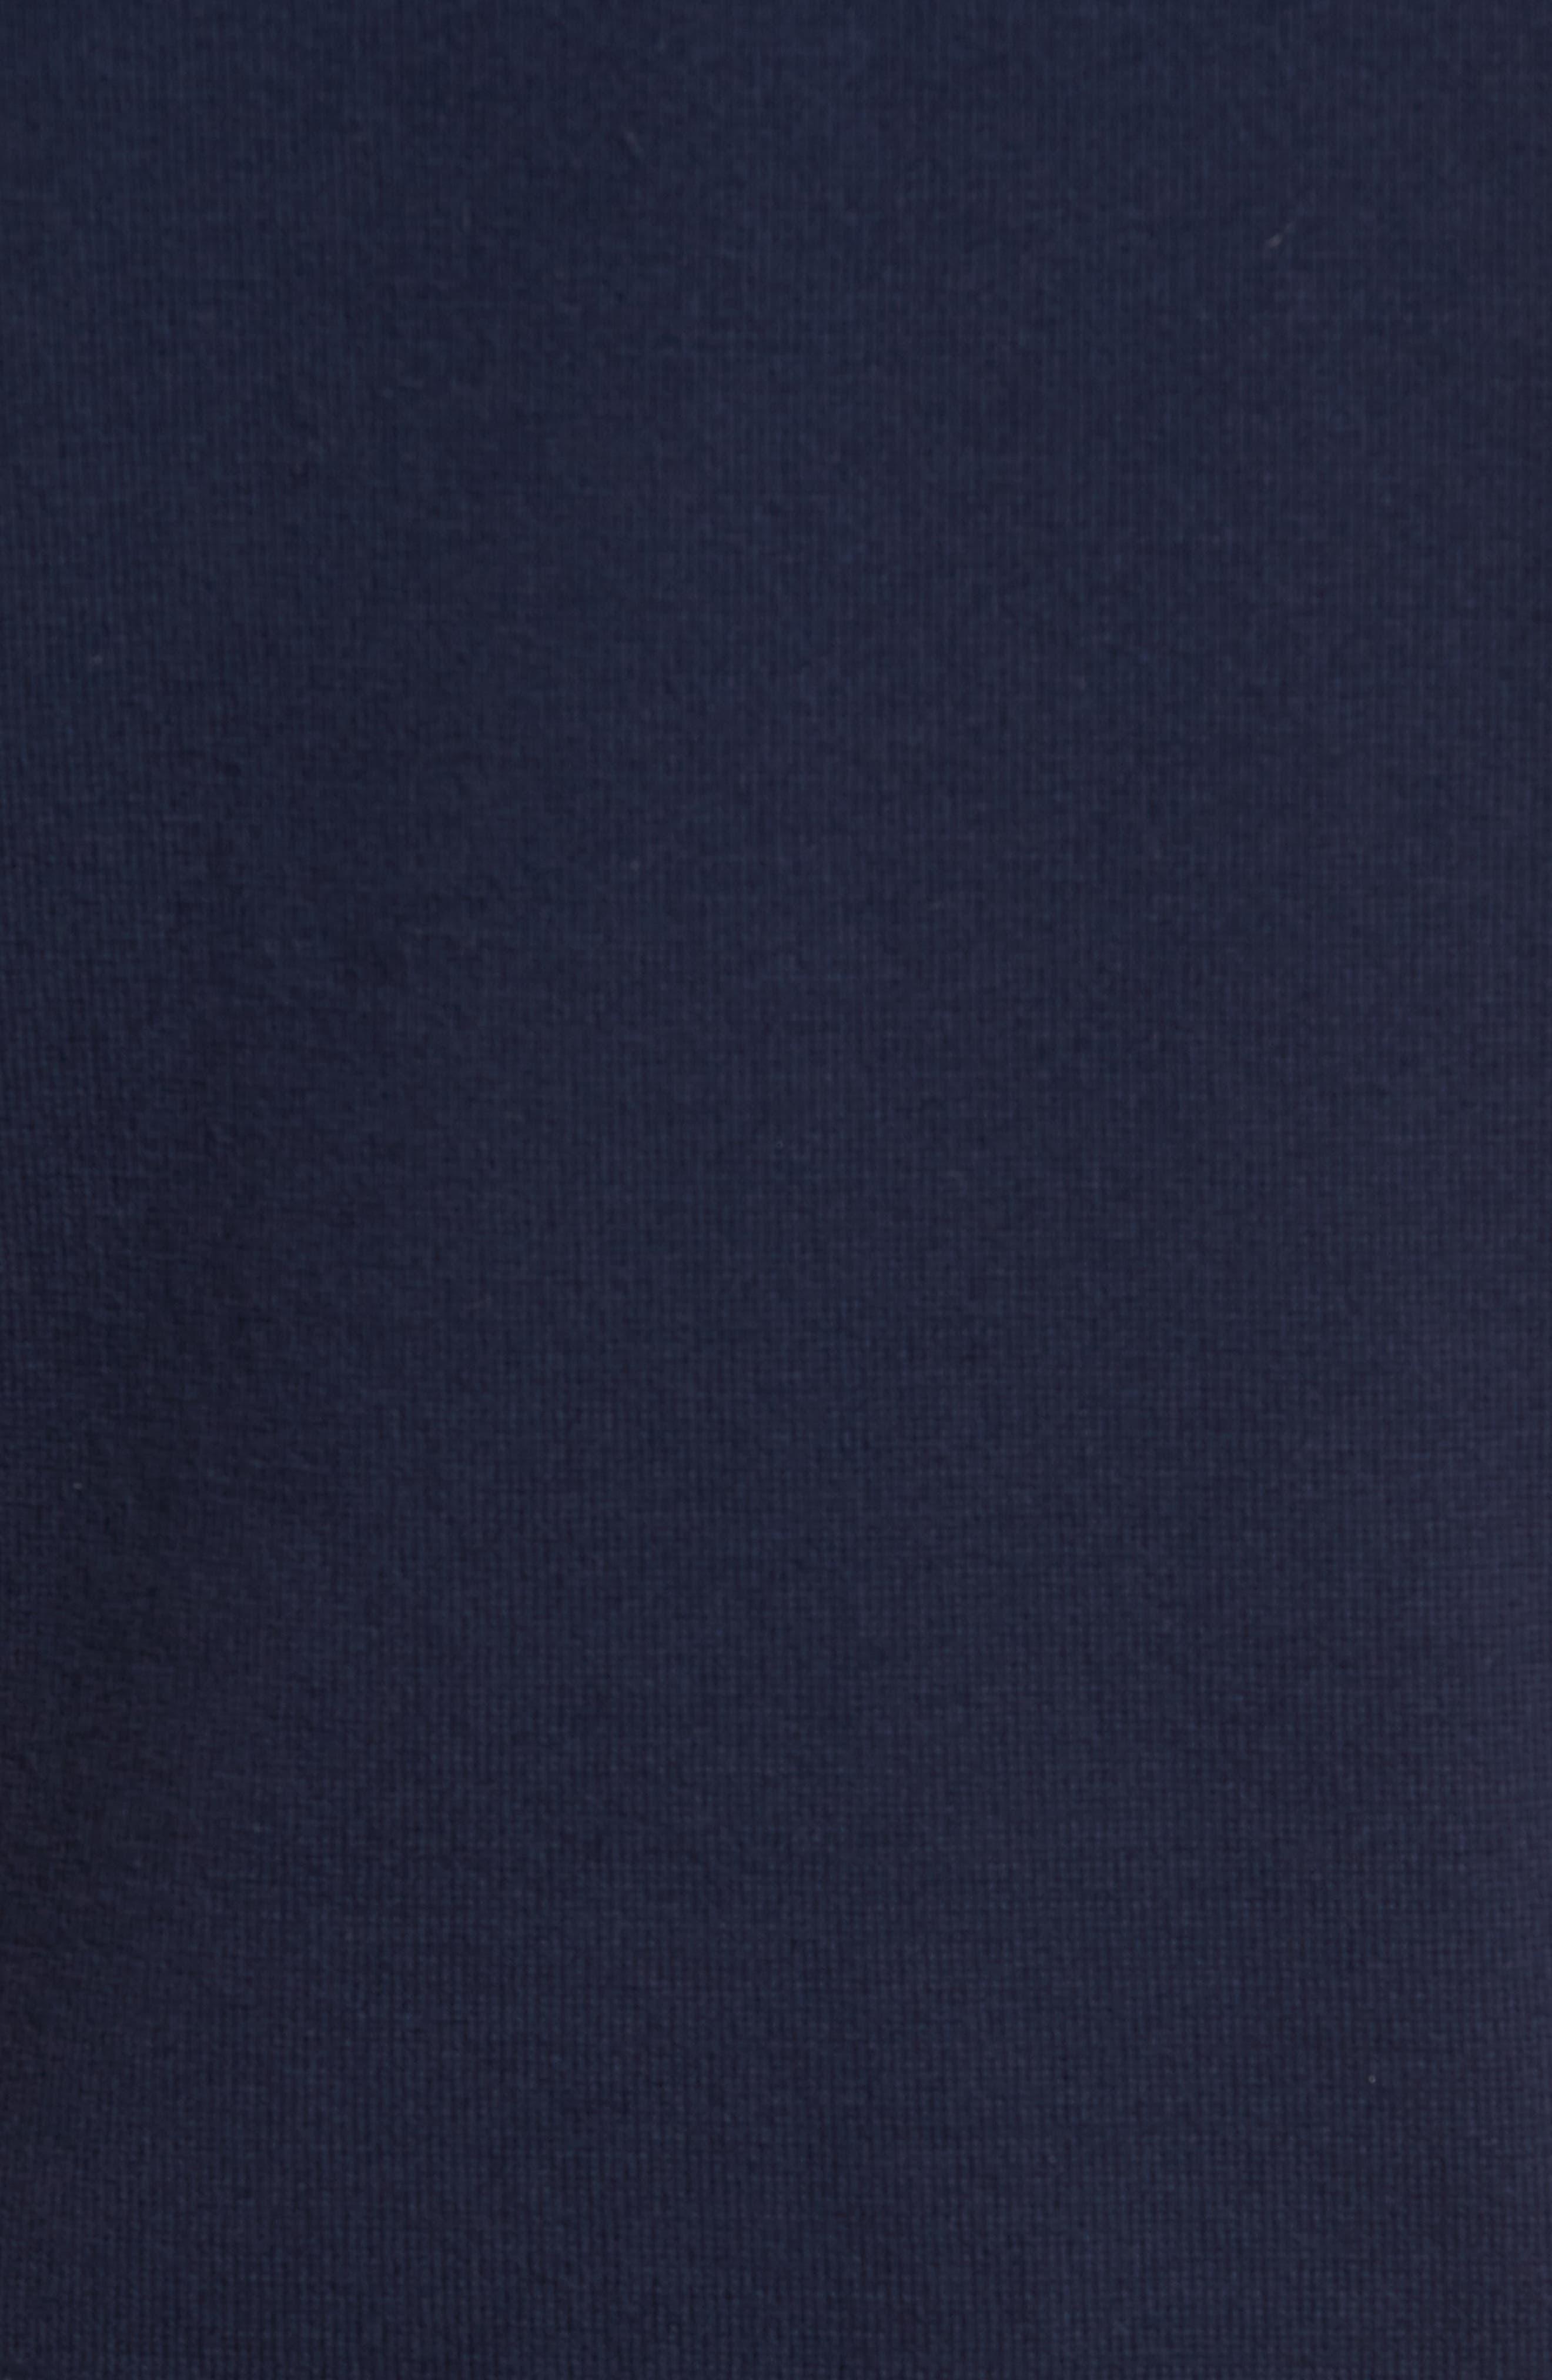 Lakemont V-Neck Sweater Vest,                             Alternate thumbnail 5, color,                             Liberty Navy